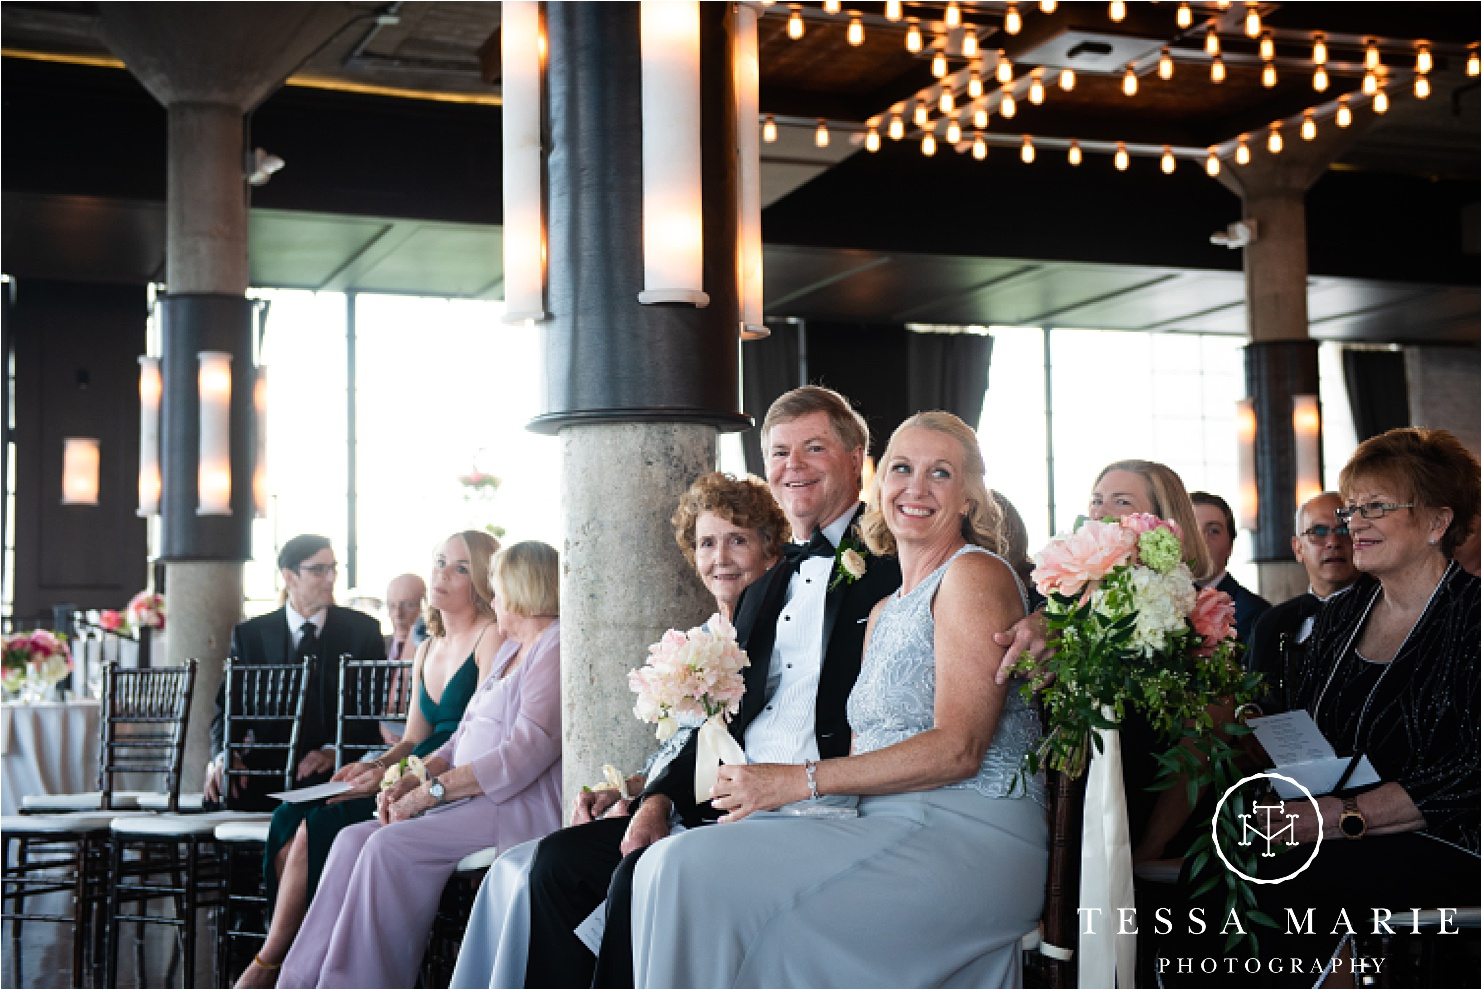 Tessa_marie_weddings_houston_wedding_photographer_The_astorian_0110.jpg